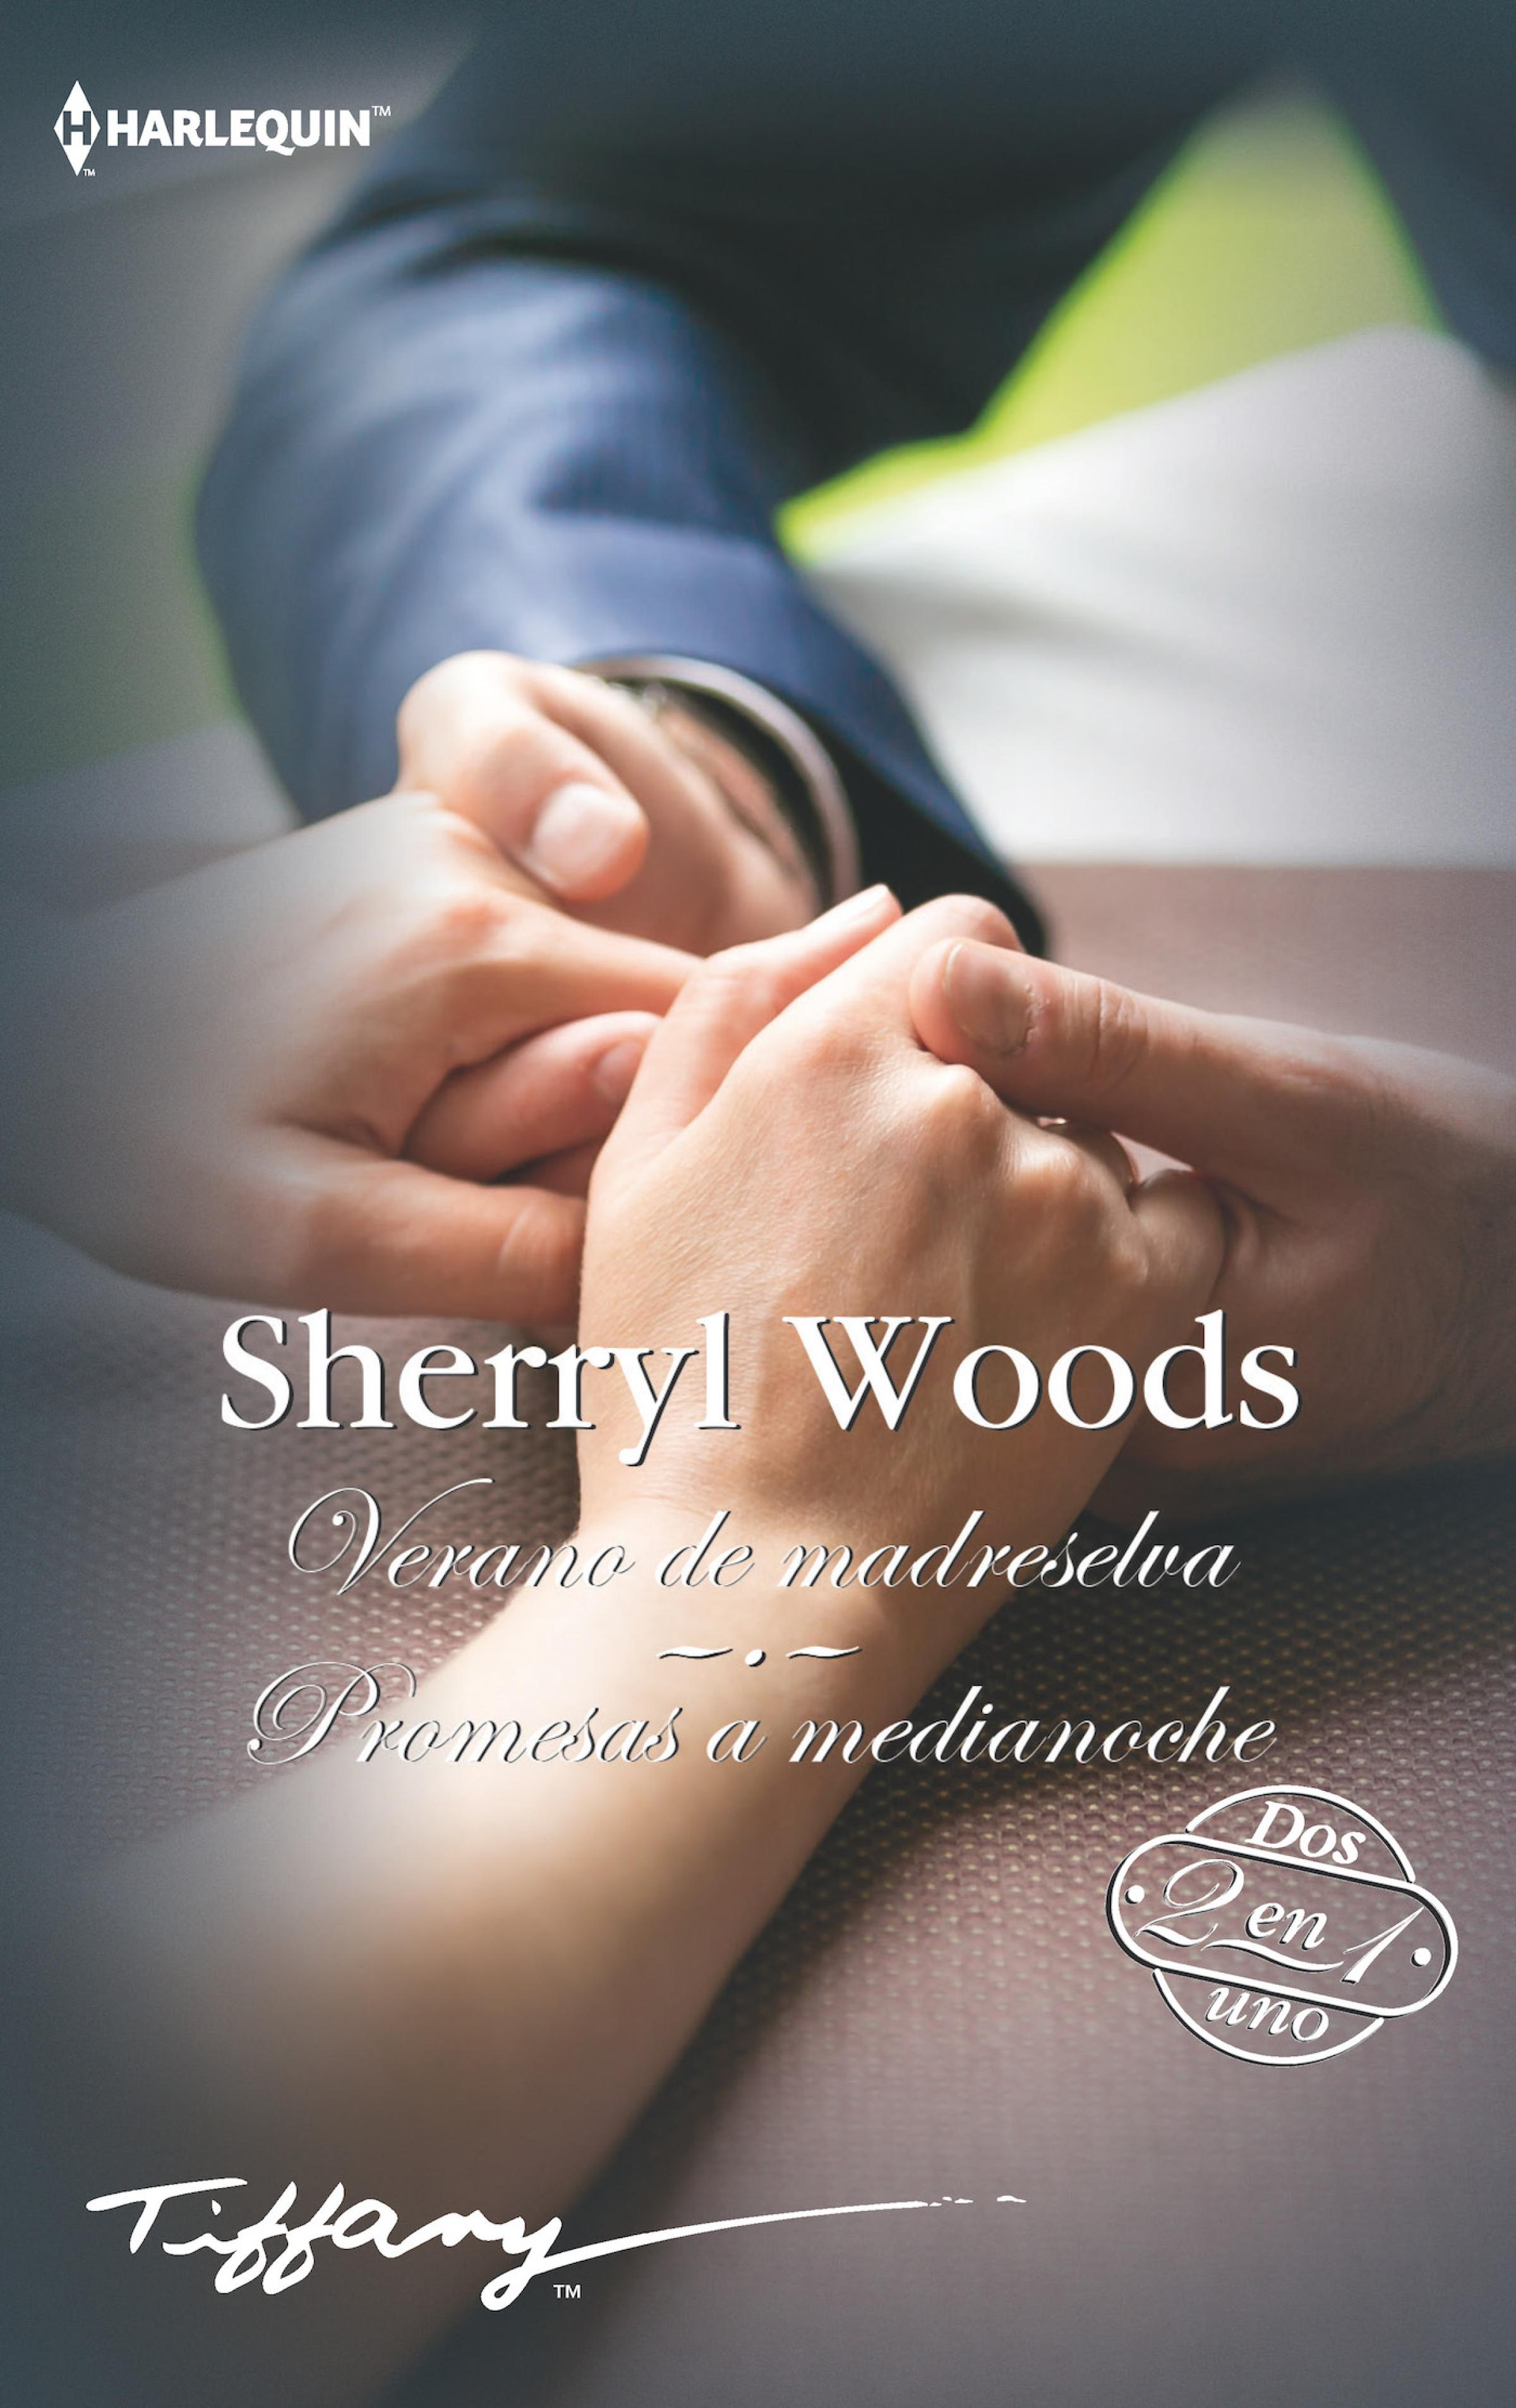 Sherryl Woods Verano de madreselva - Promesas a medianoche недорого